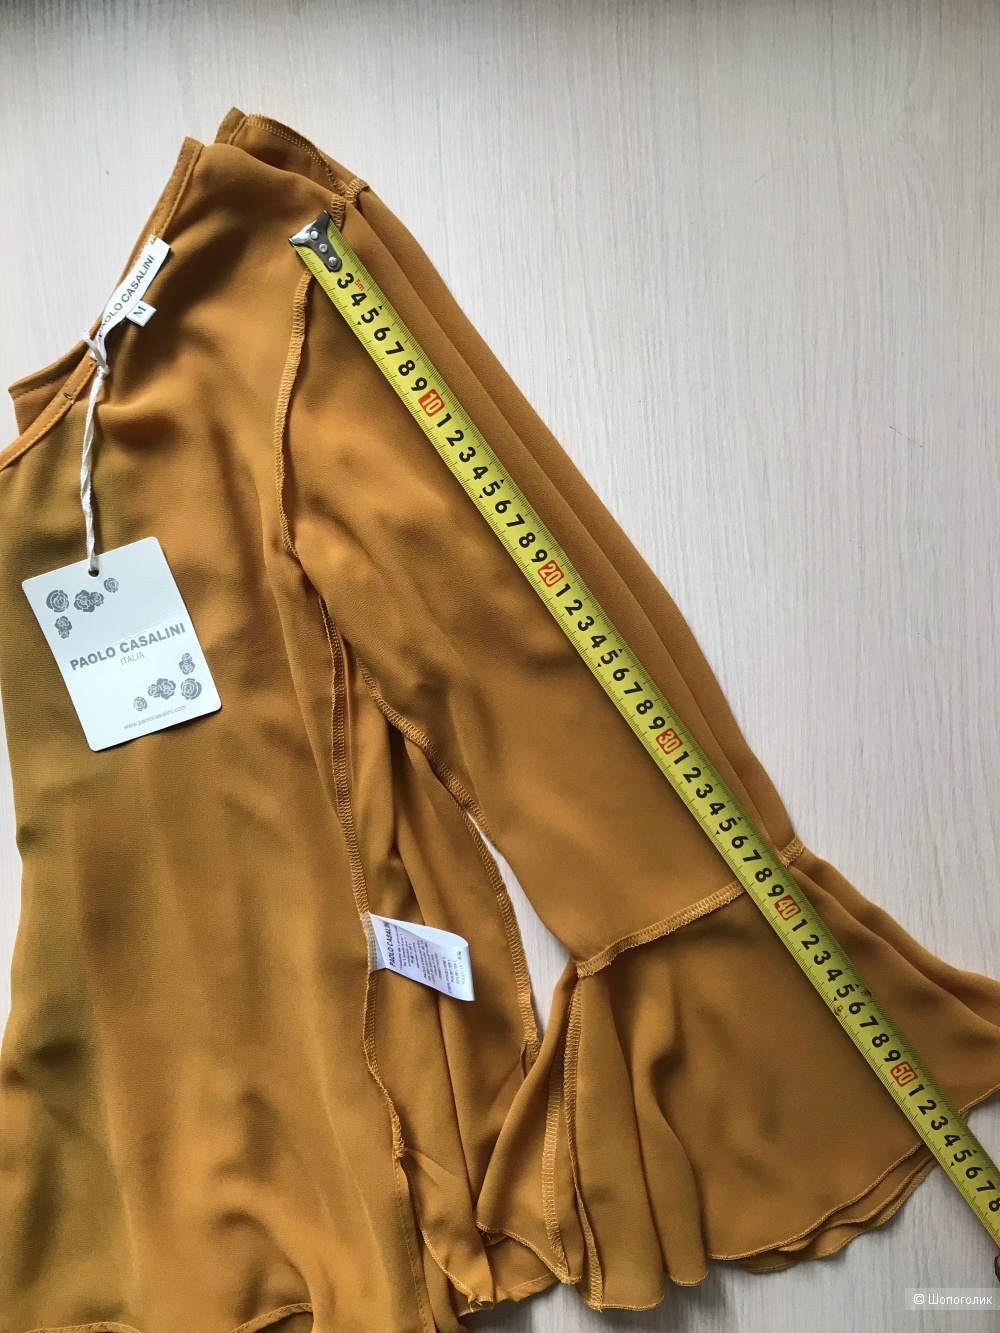 Блузка PAOLO CASALINI, размер M (46).